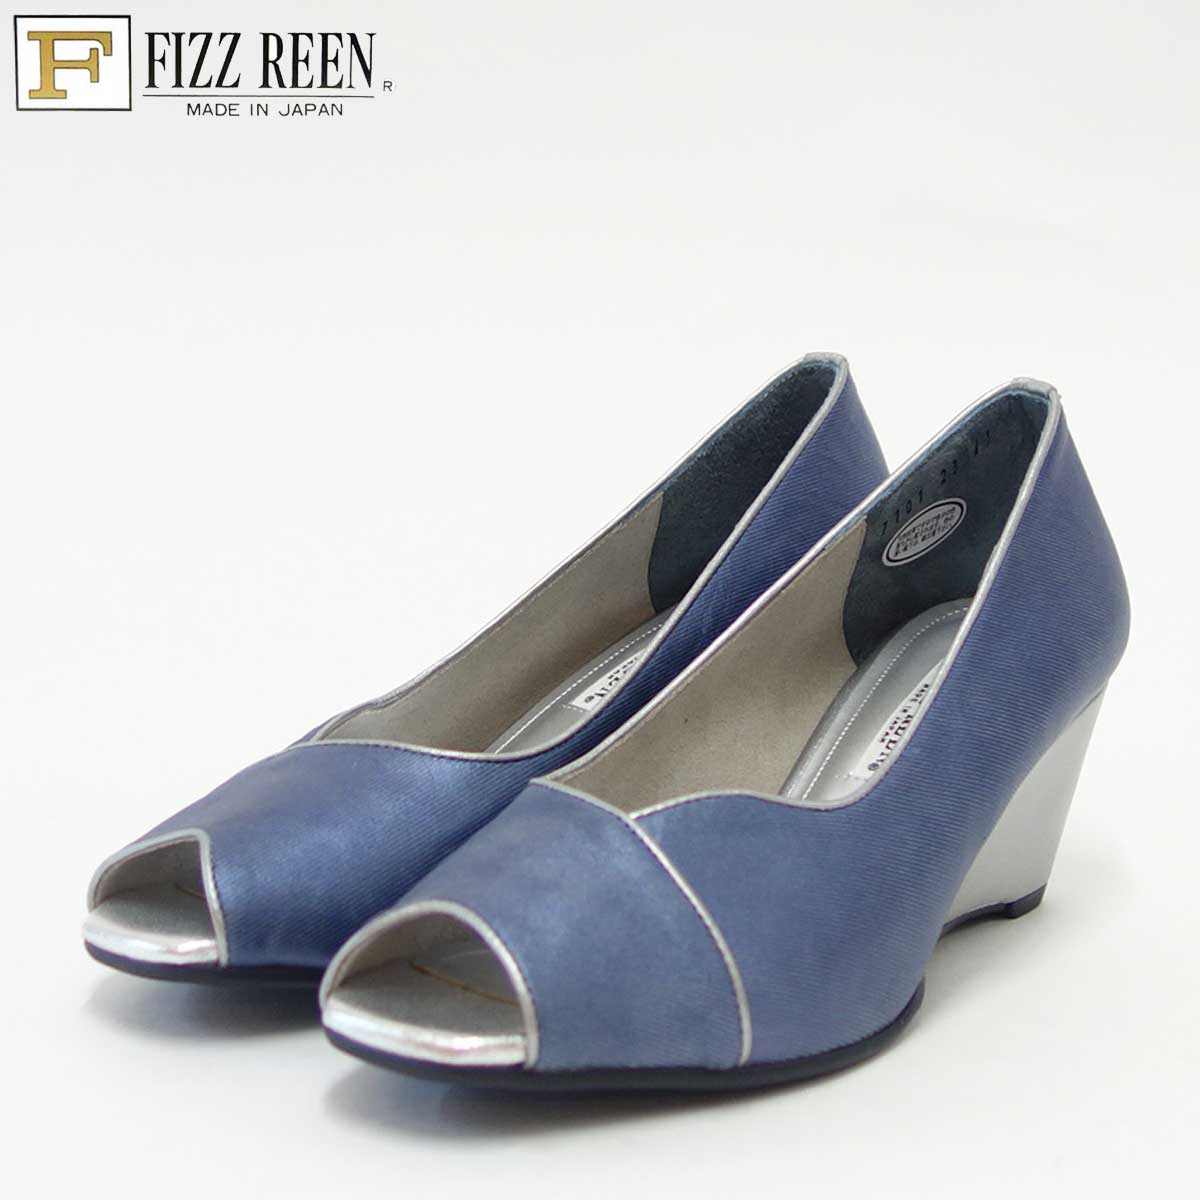 FIZZ REEN フィズリーン 7101 ネイビーメタ(レディース)快適EEEのウェッジヒールパンプス(日本製)「靴」